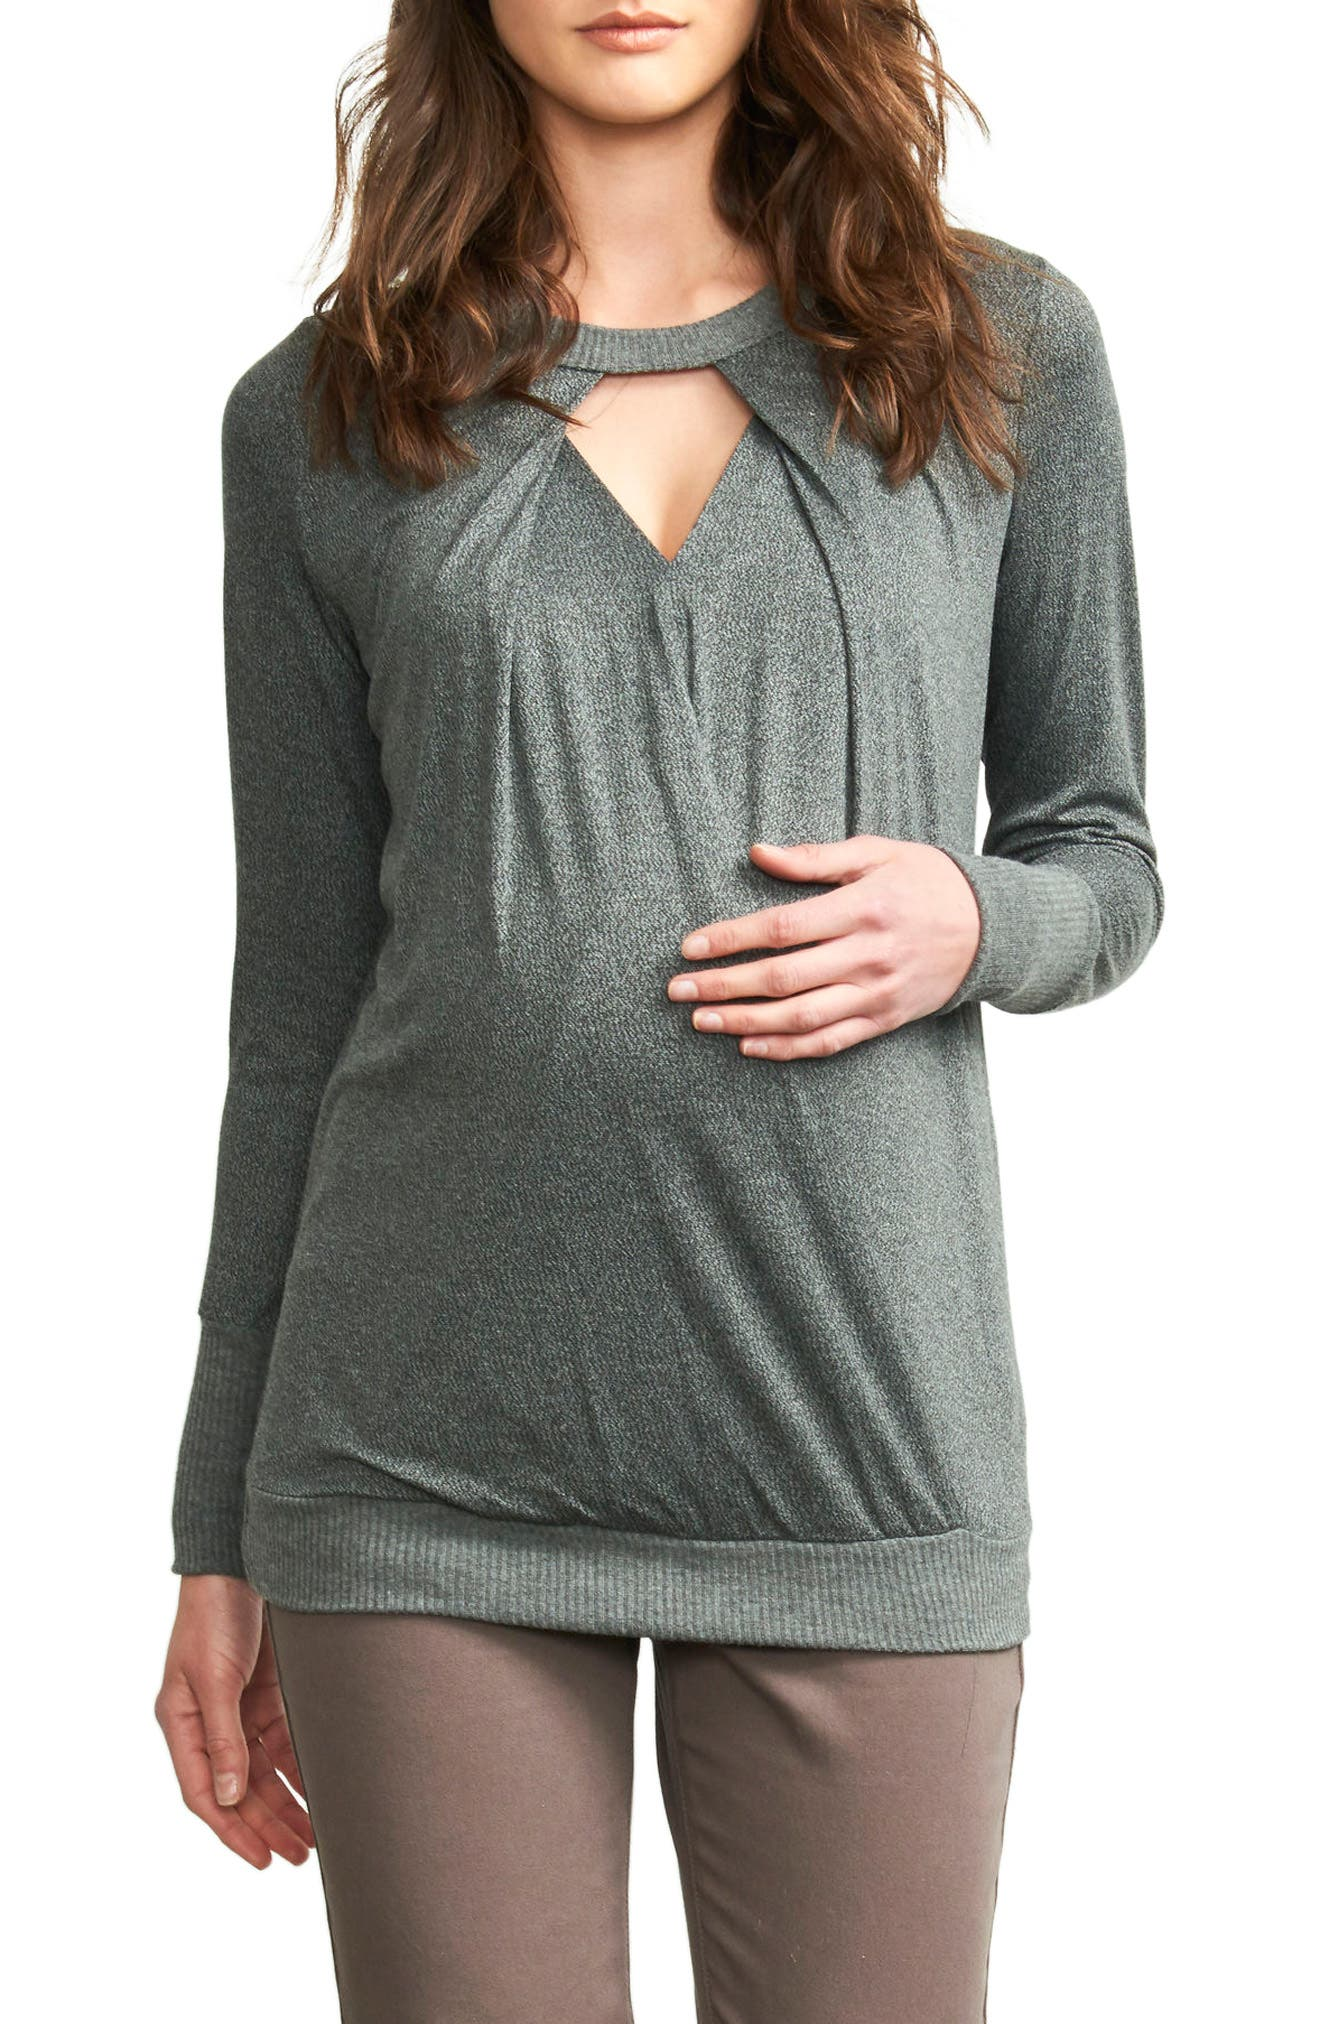 Maternity America Keyhole Maternity Top,                         Main,                         color, Stone Grey